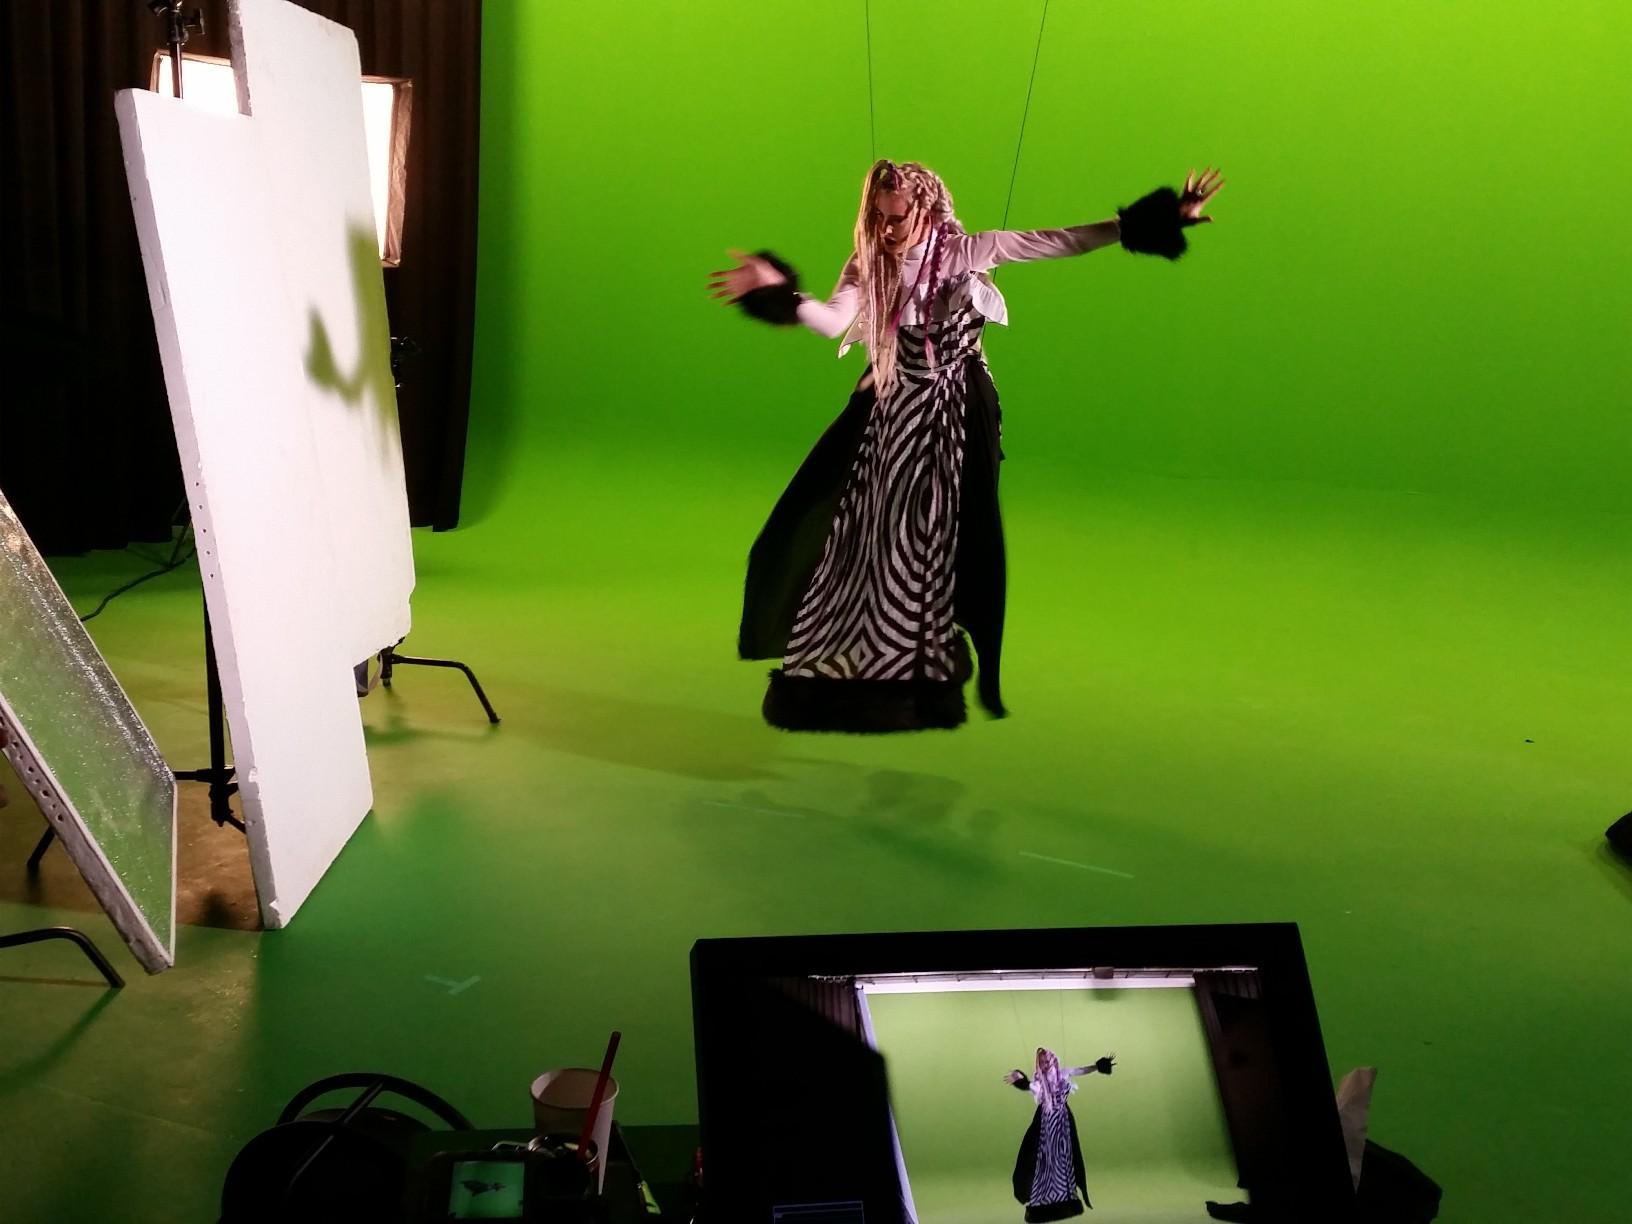 filmtv studio in almere chromakey studio